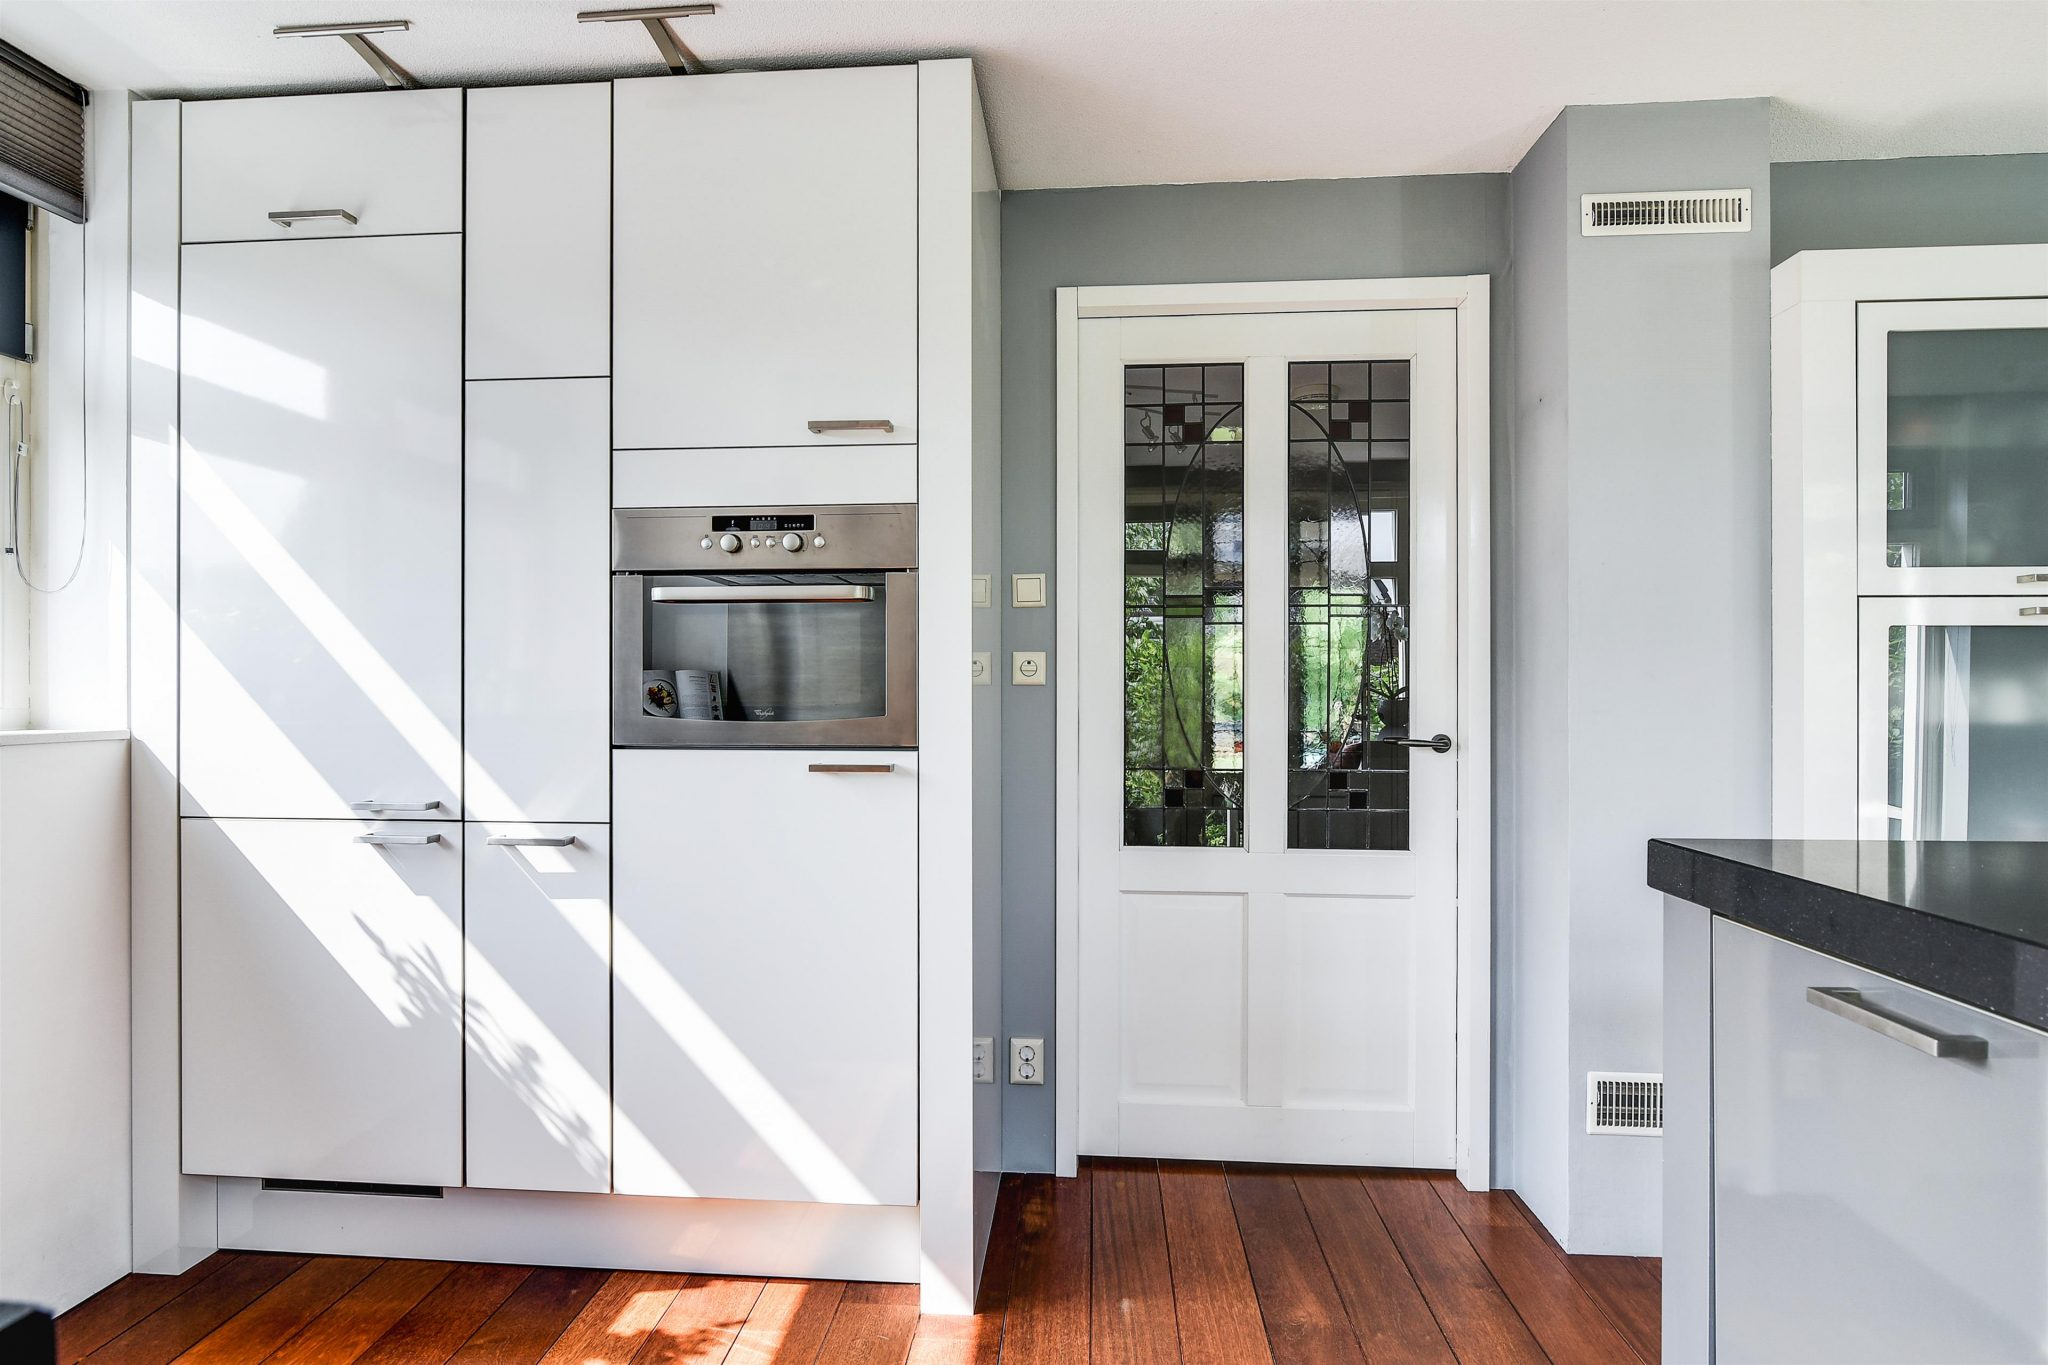 Grijze Moderne Keuken : Moderne wit grijze keuken eiland vitrinekast graniet